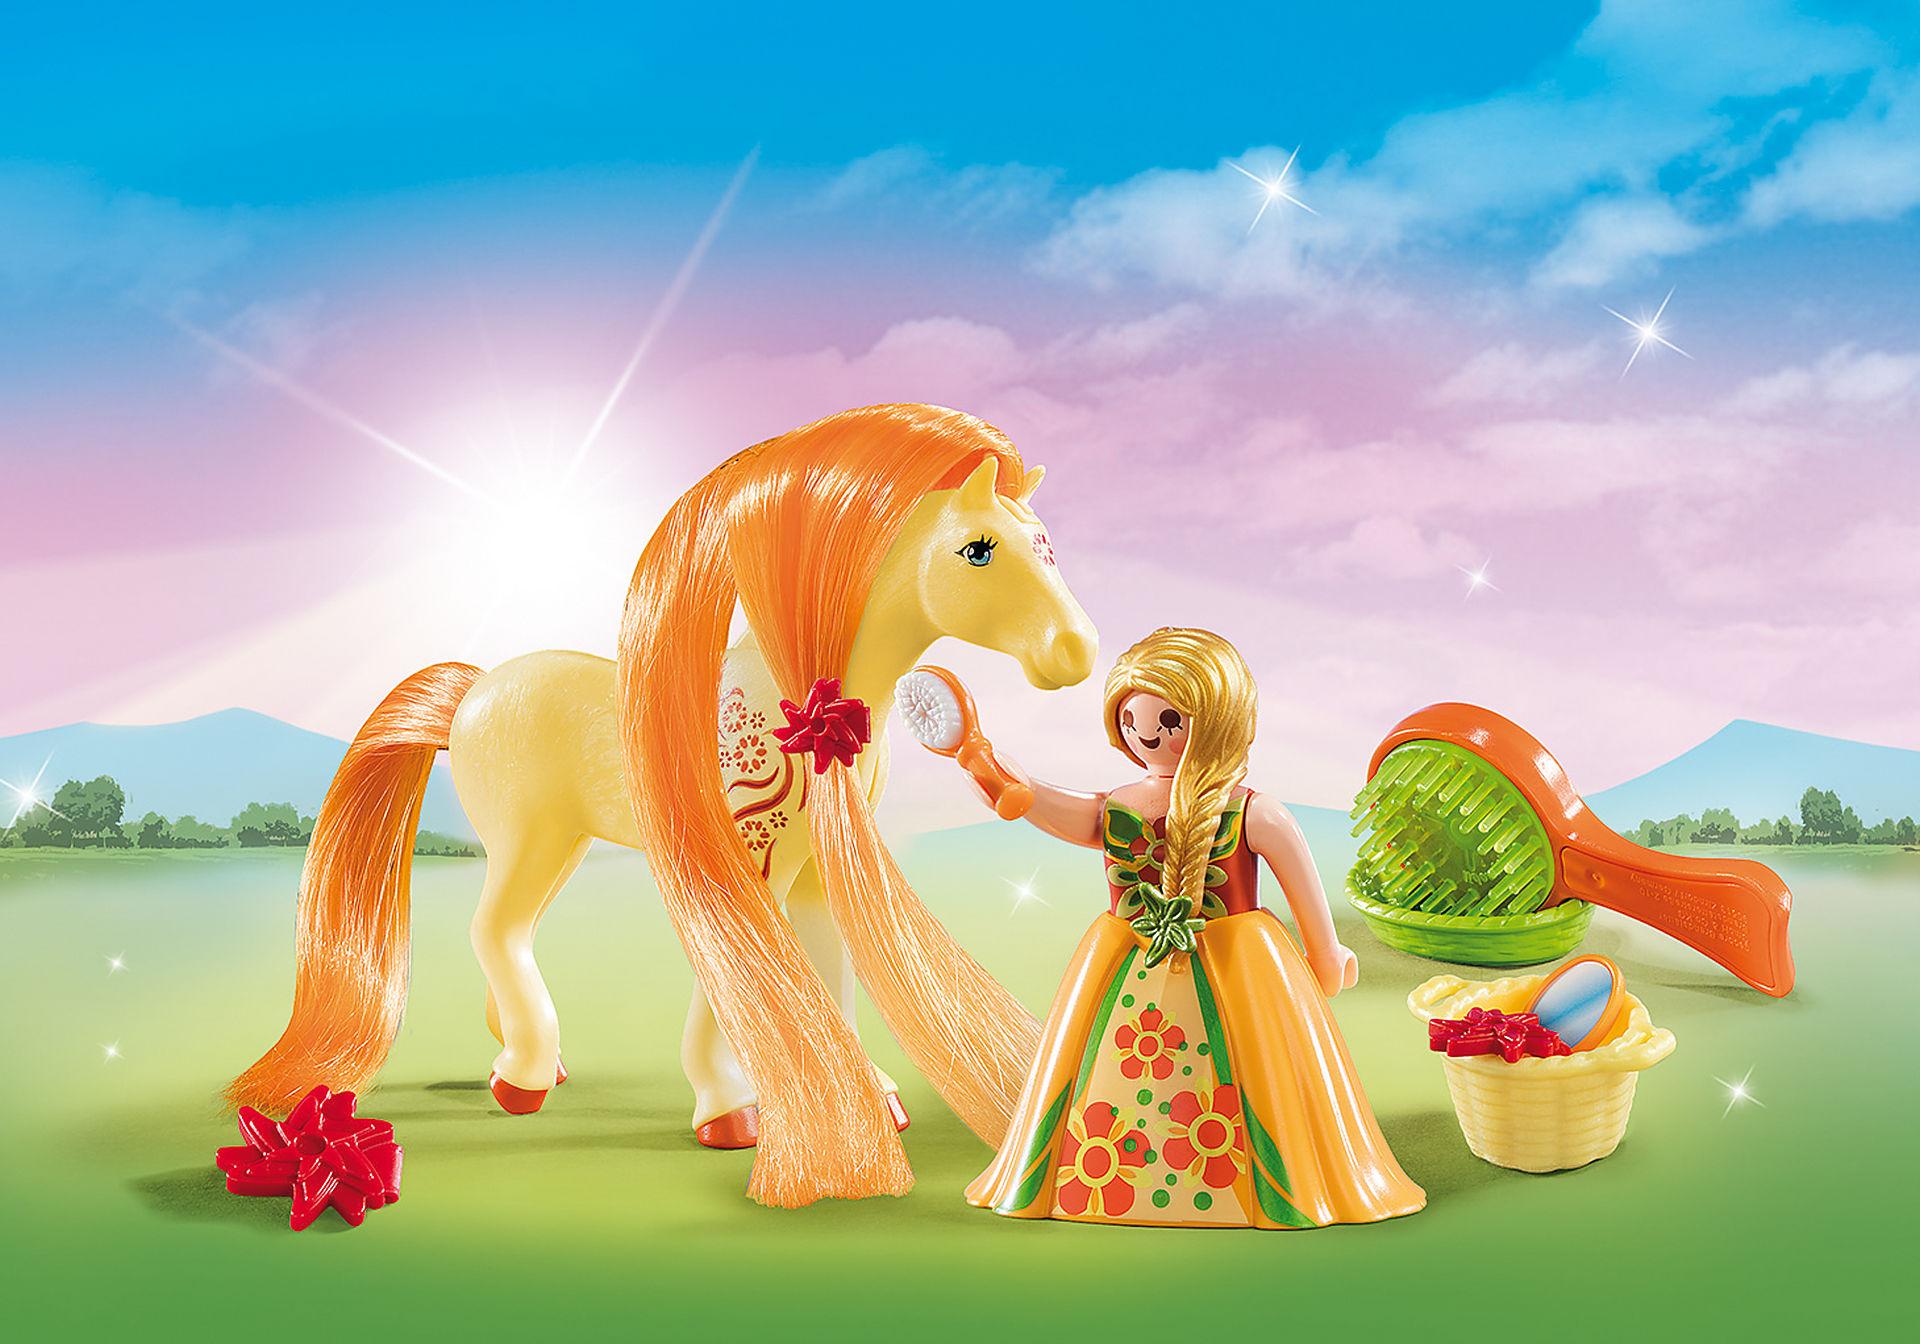 http://media.playmobil.com/i/playmobil/5656_product_detail/Maxi Βαλιτσάκι Πριγκίπισσα με άλογο